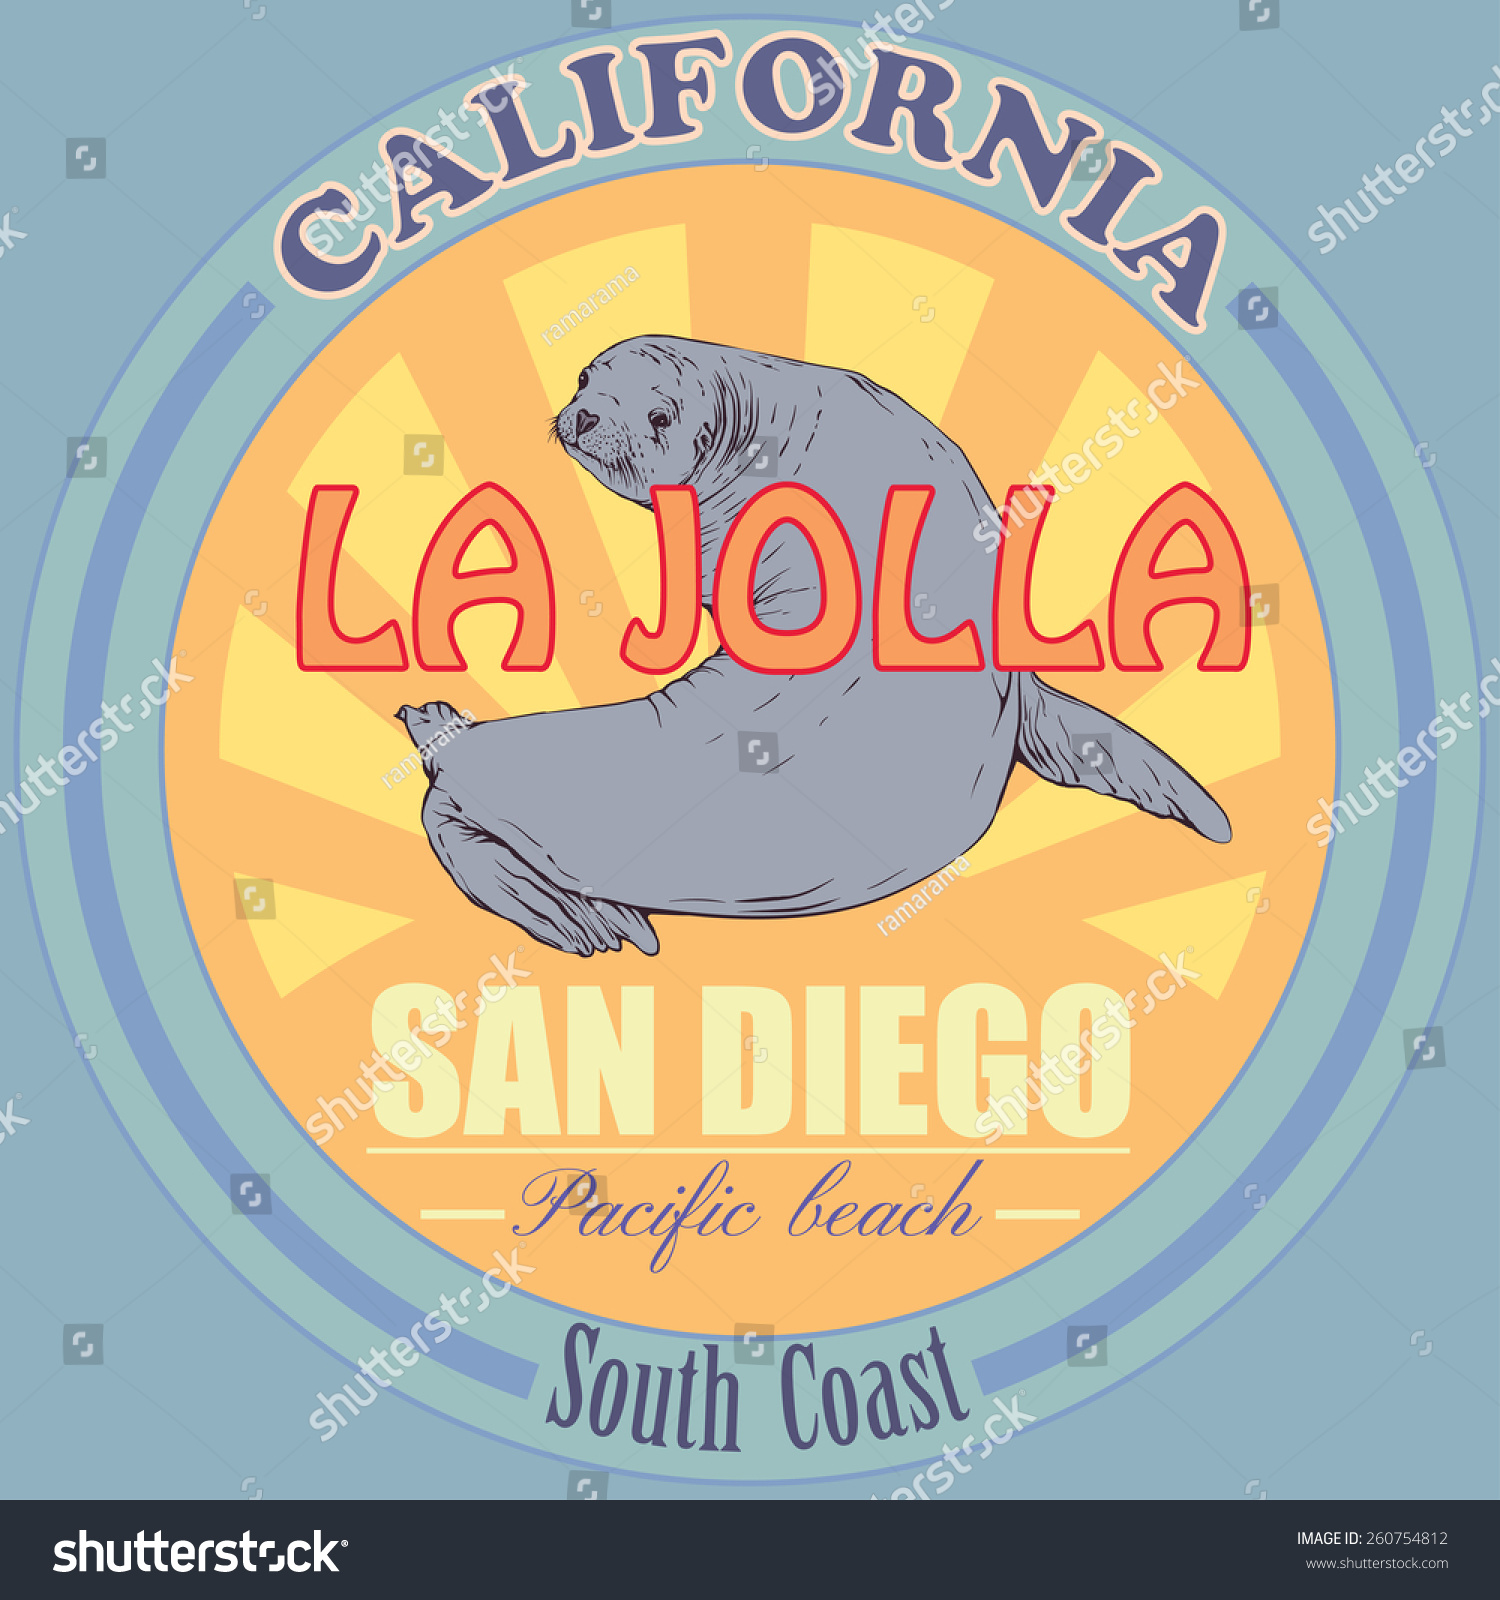 Shirt design san diego - T Shirt Design Seal Vector Graphic Illustration California San Diego La Jolla Beach